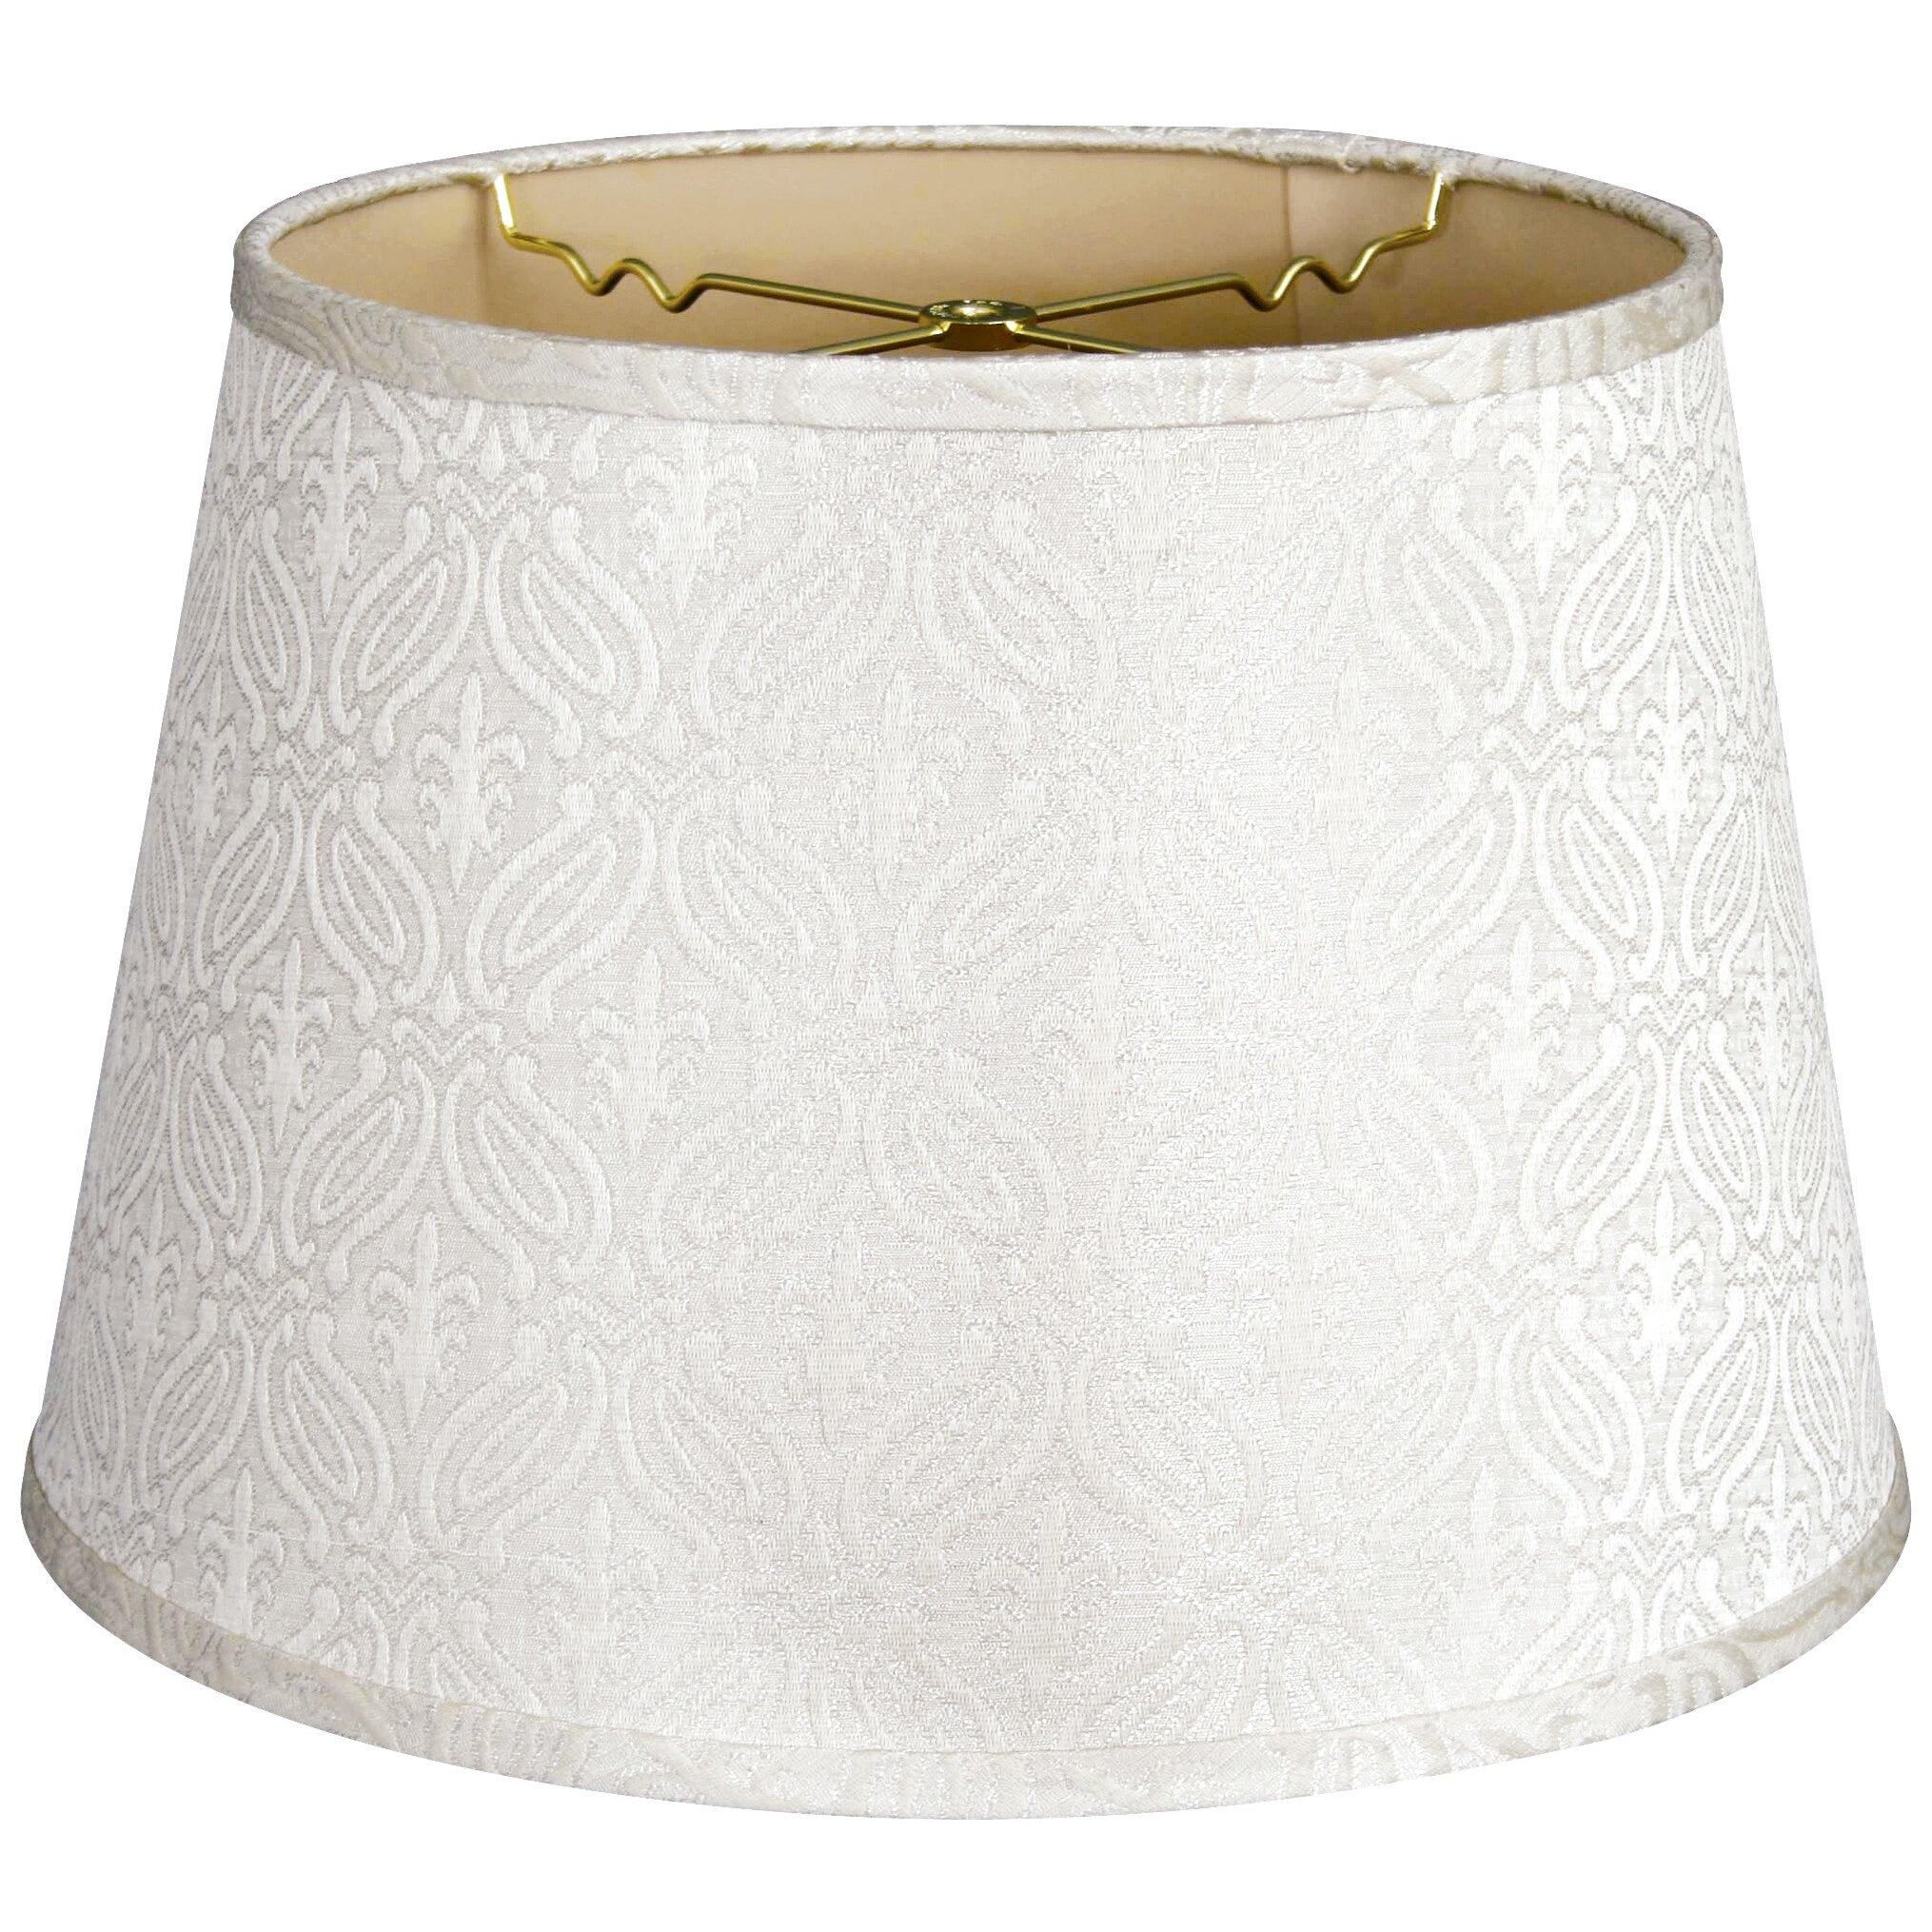 royaldesigns 18 timeless shantung shallow drum lamp shade. Black Bedroom Furniture Sets. Home Design Ideas